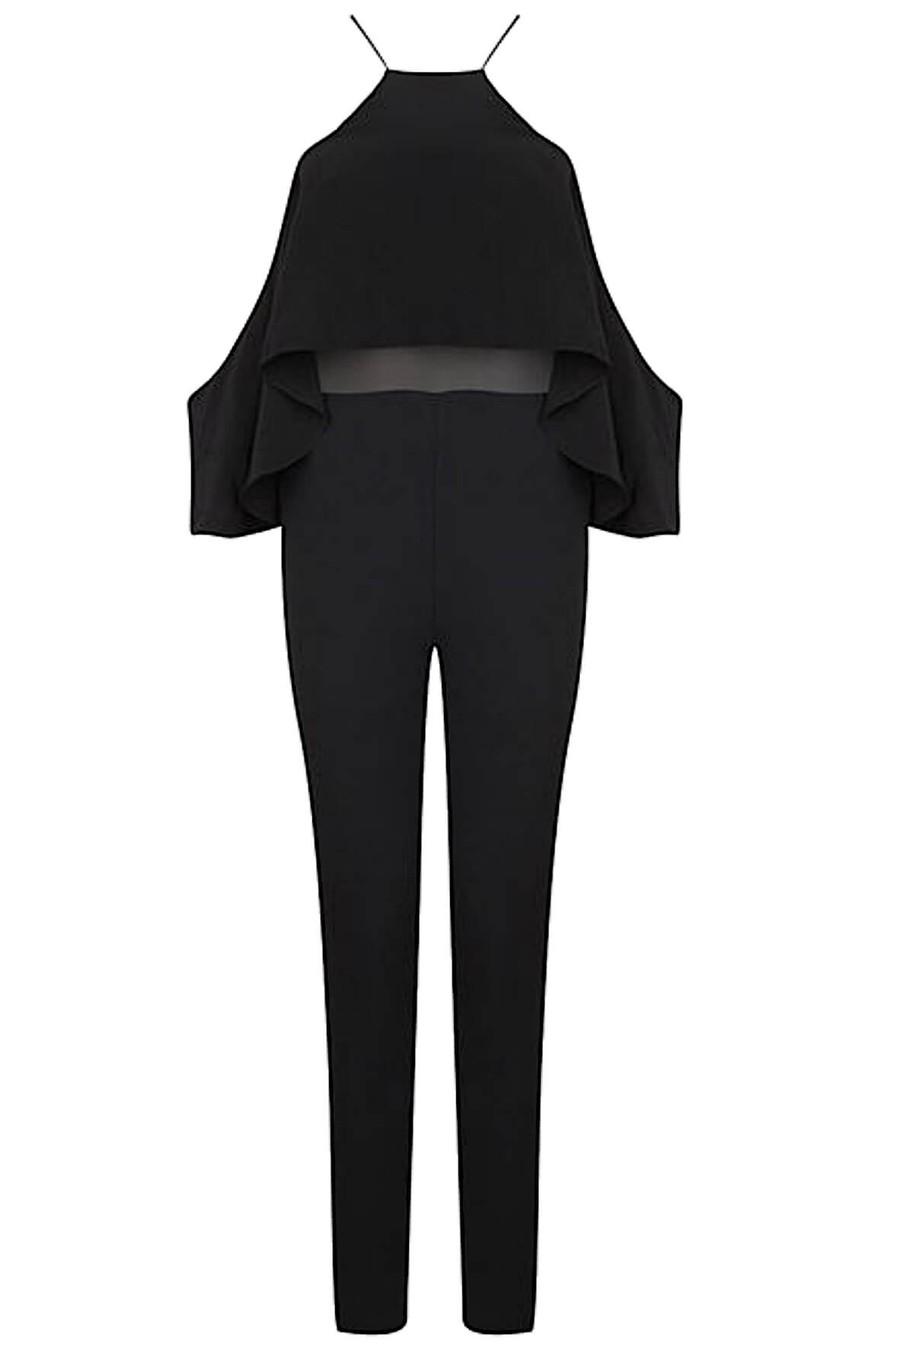 Style Theory_Crazy Rich Asians_quiz_ststudio-open-shoulder-jumpsuit-1